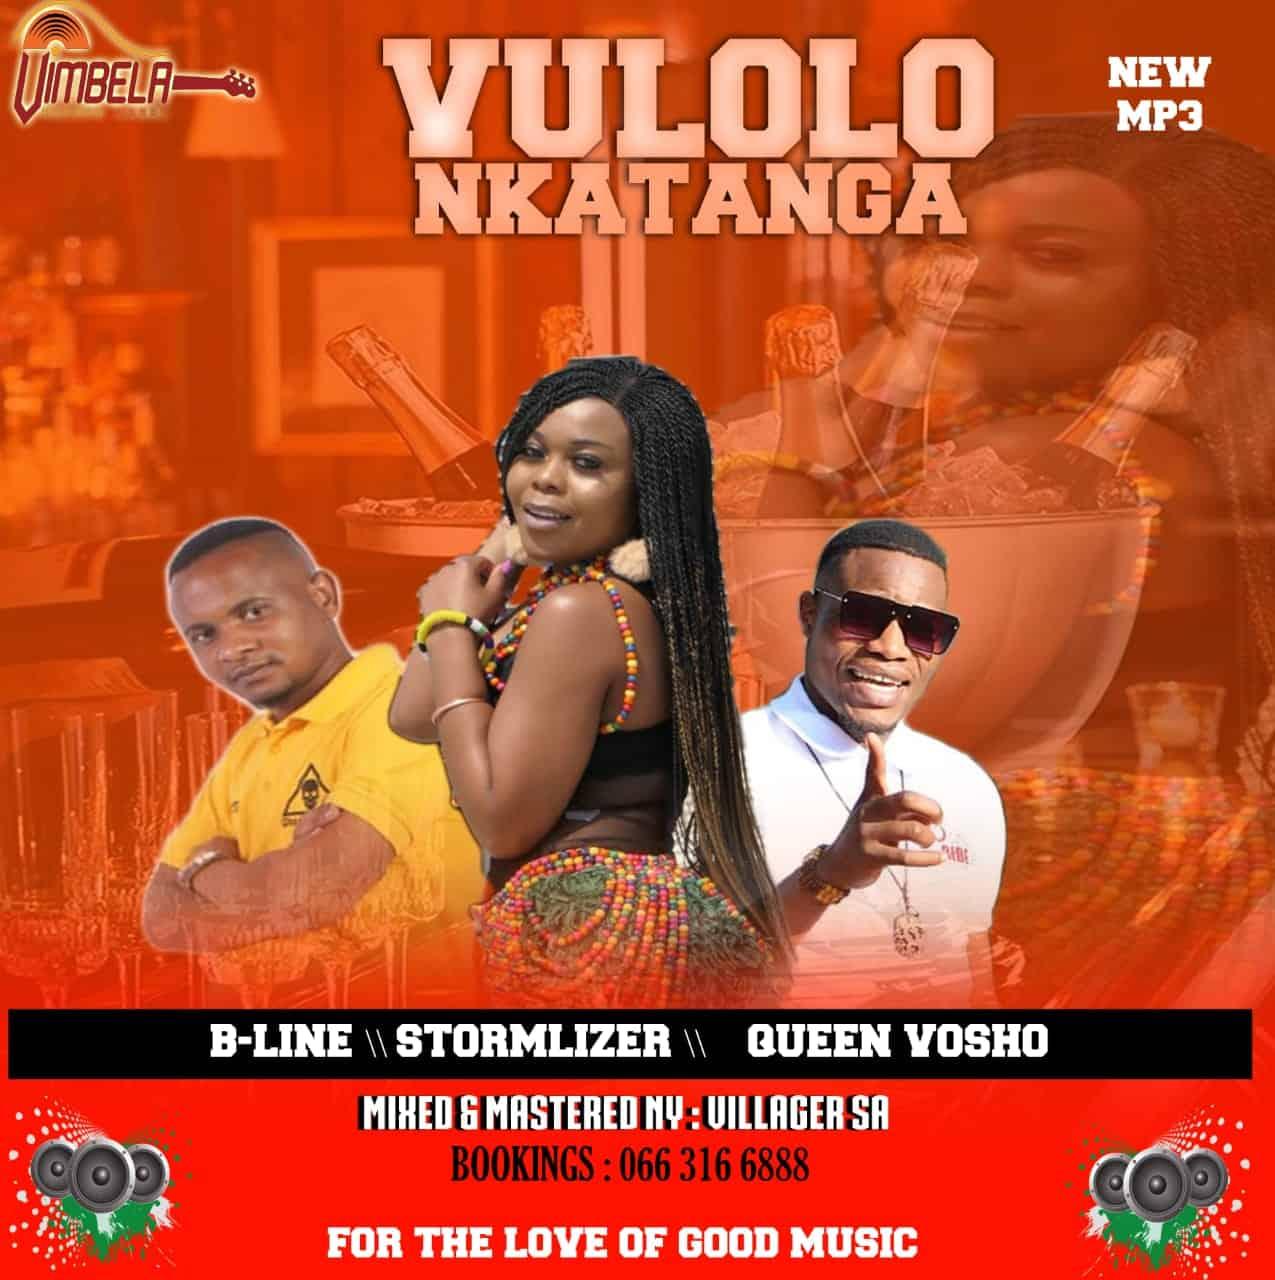 Mr B Line - Vulolo Nkatanga Ft Queen Vosho & Stormlyzer